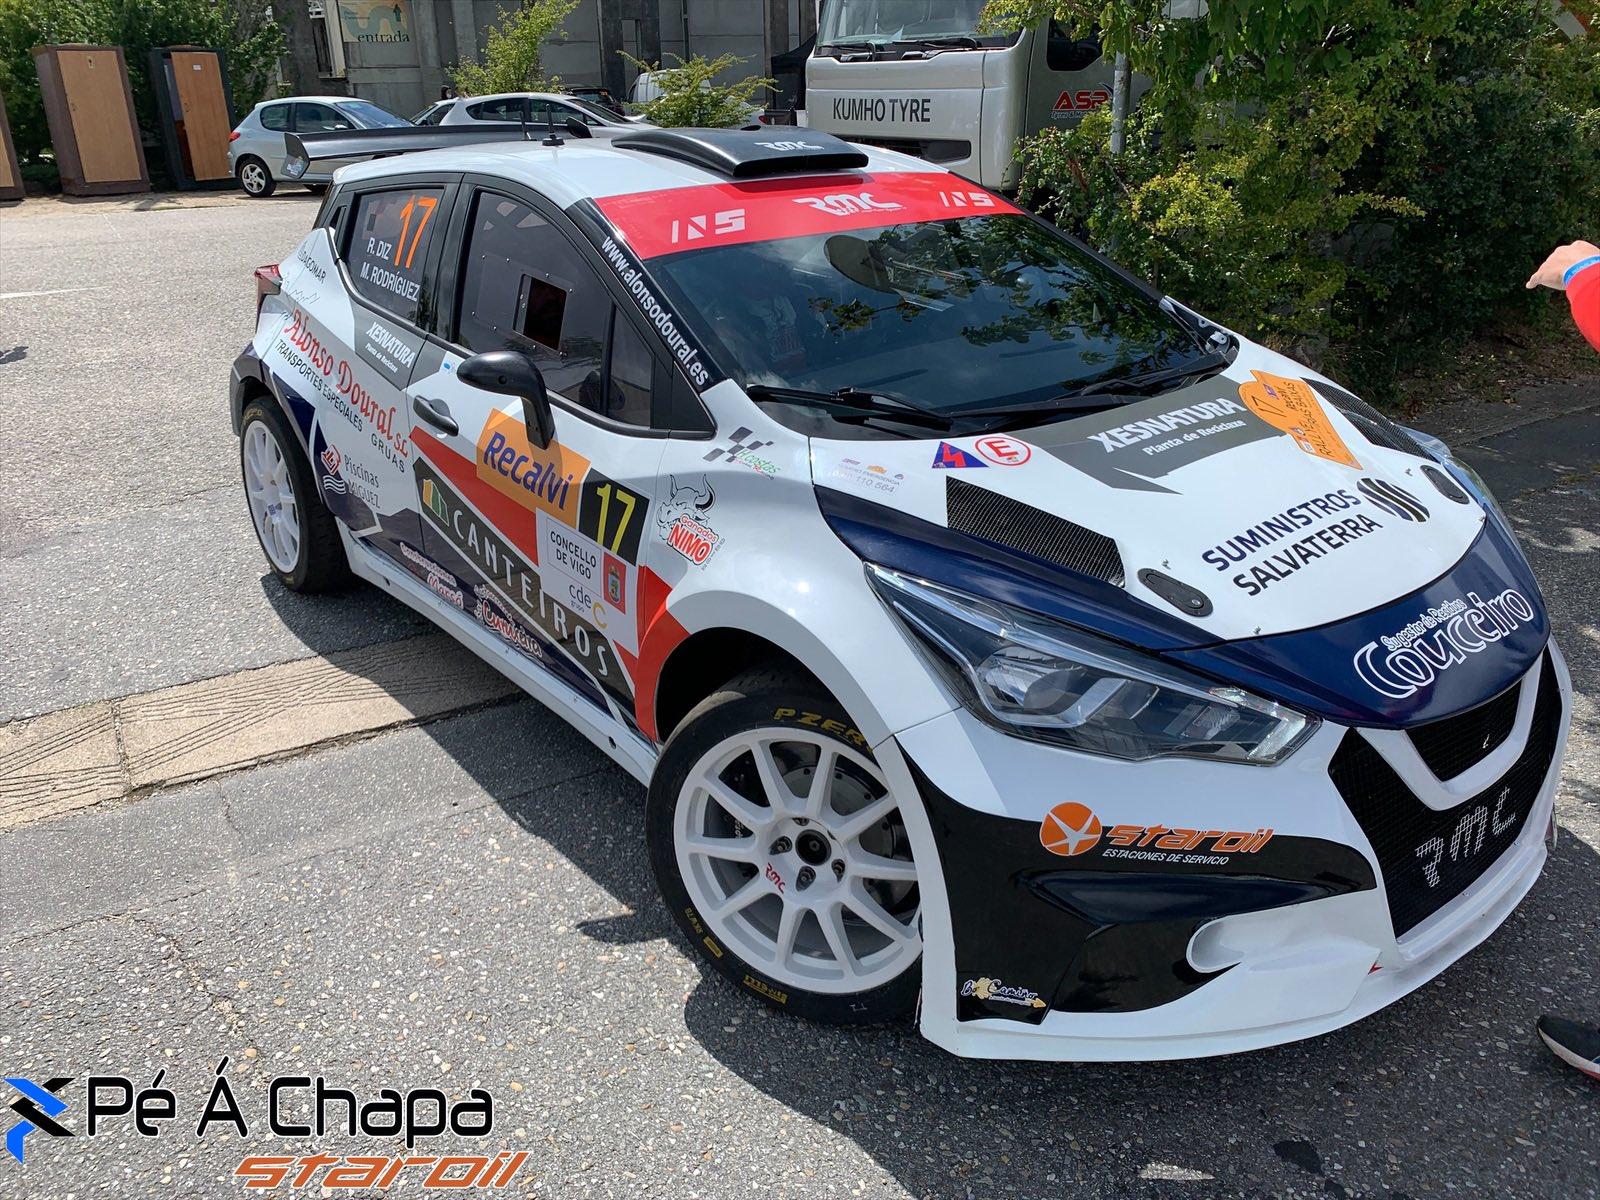 CERA: 54º Rallye Recalvi Rias Baixas [23-25 Julio] E6_WyFjX0AIcKY1?format=jpg&name=large